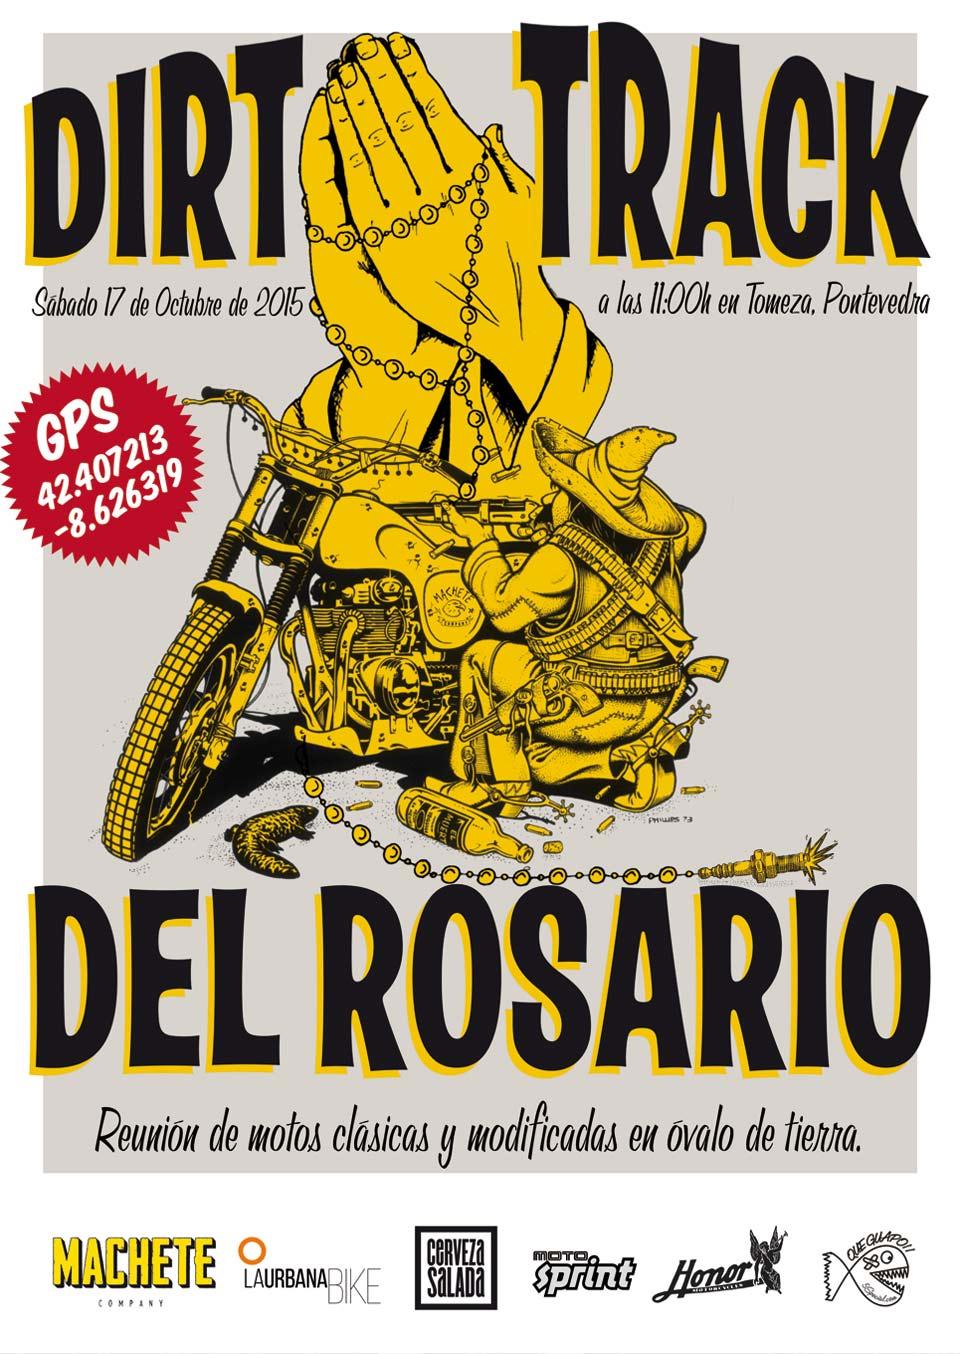 delrosariodirtrack20